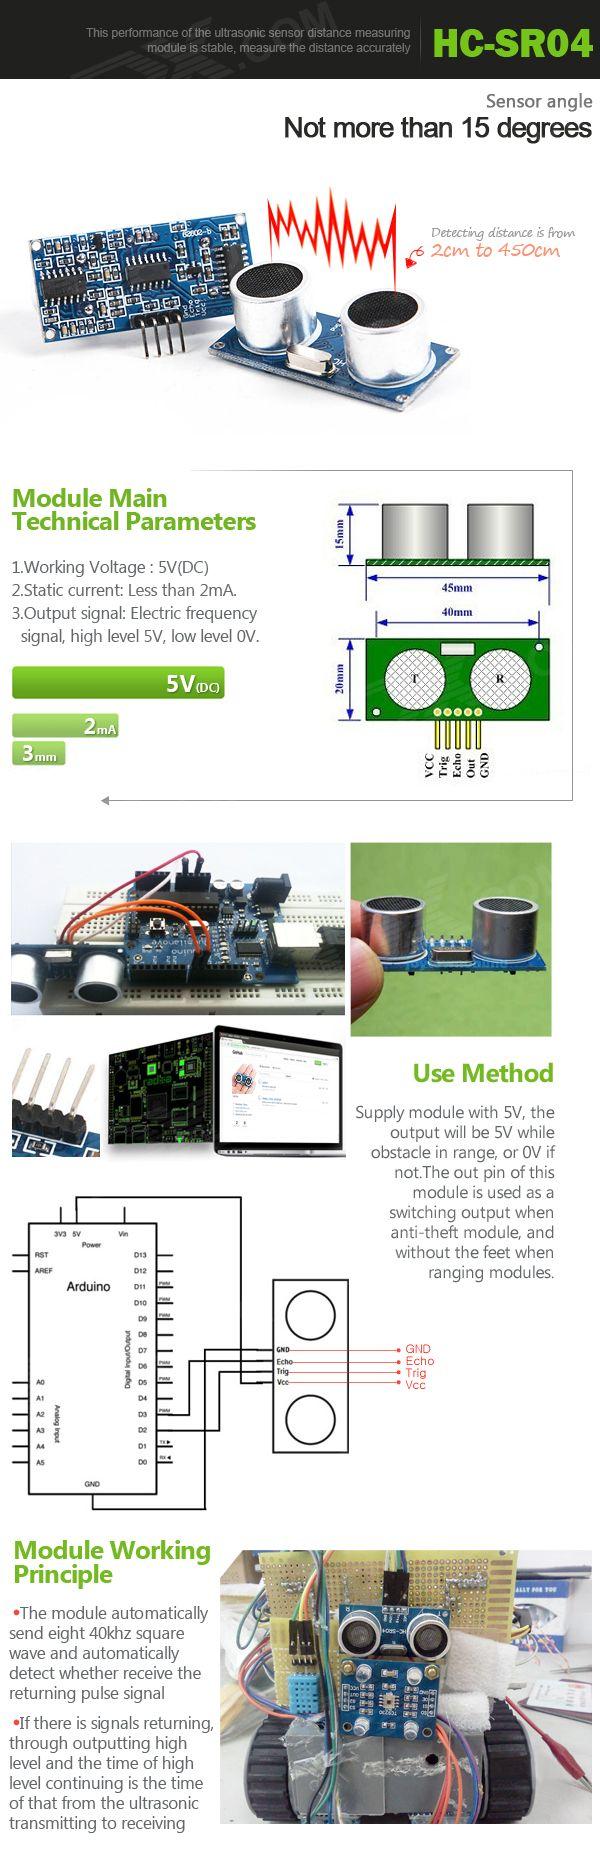 HC-SR04 Ultrasonic Sensor Distance Measuring Module - Blue - Free Shipping - DealExtreme